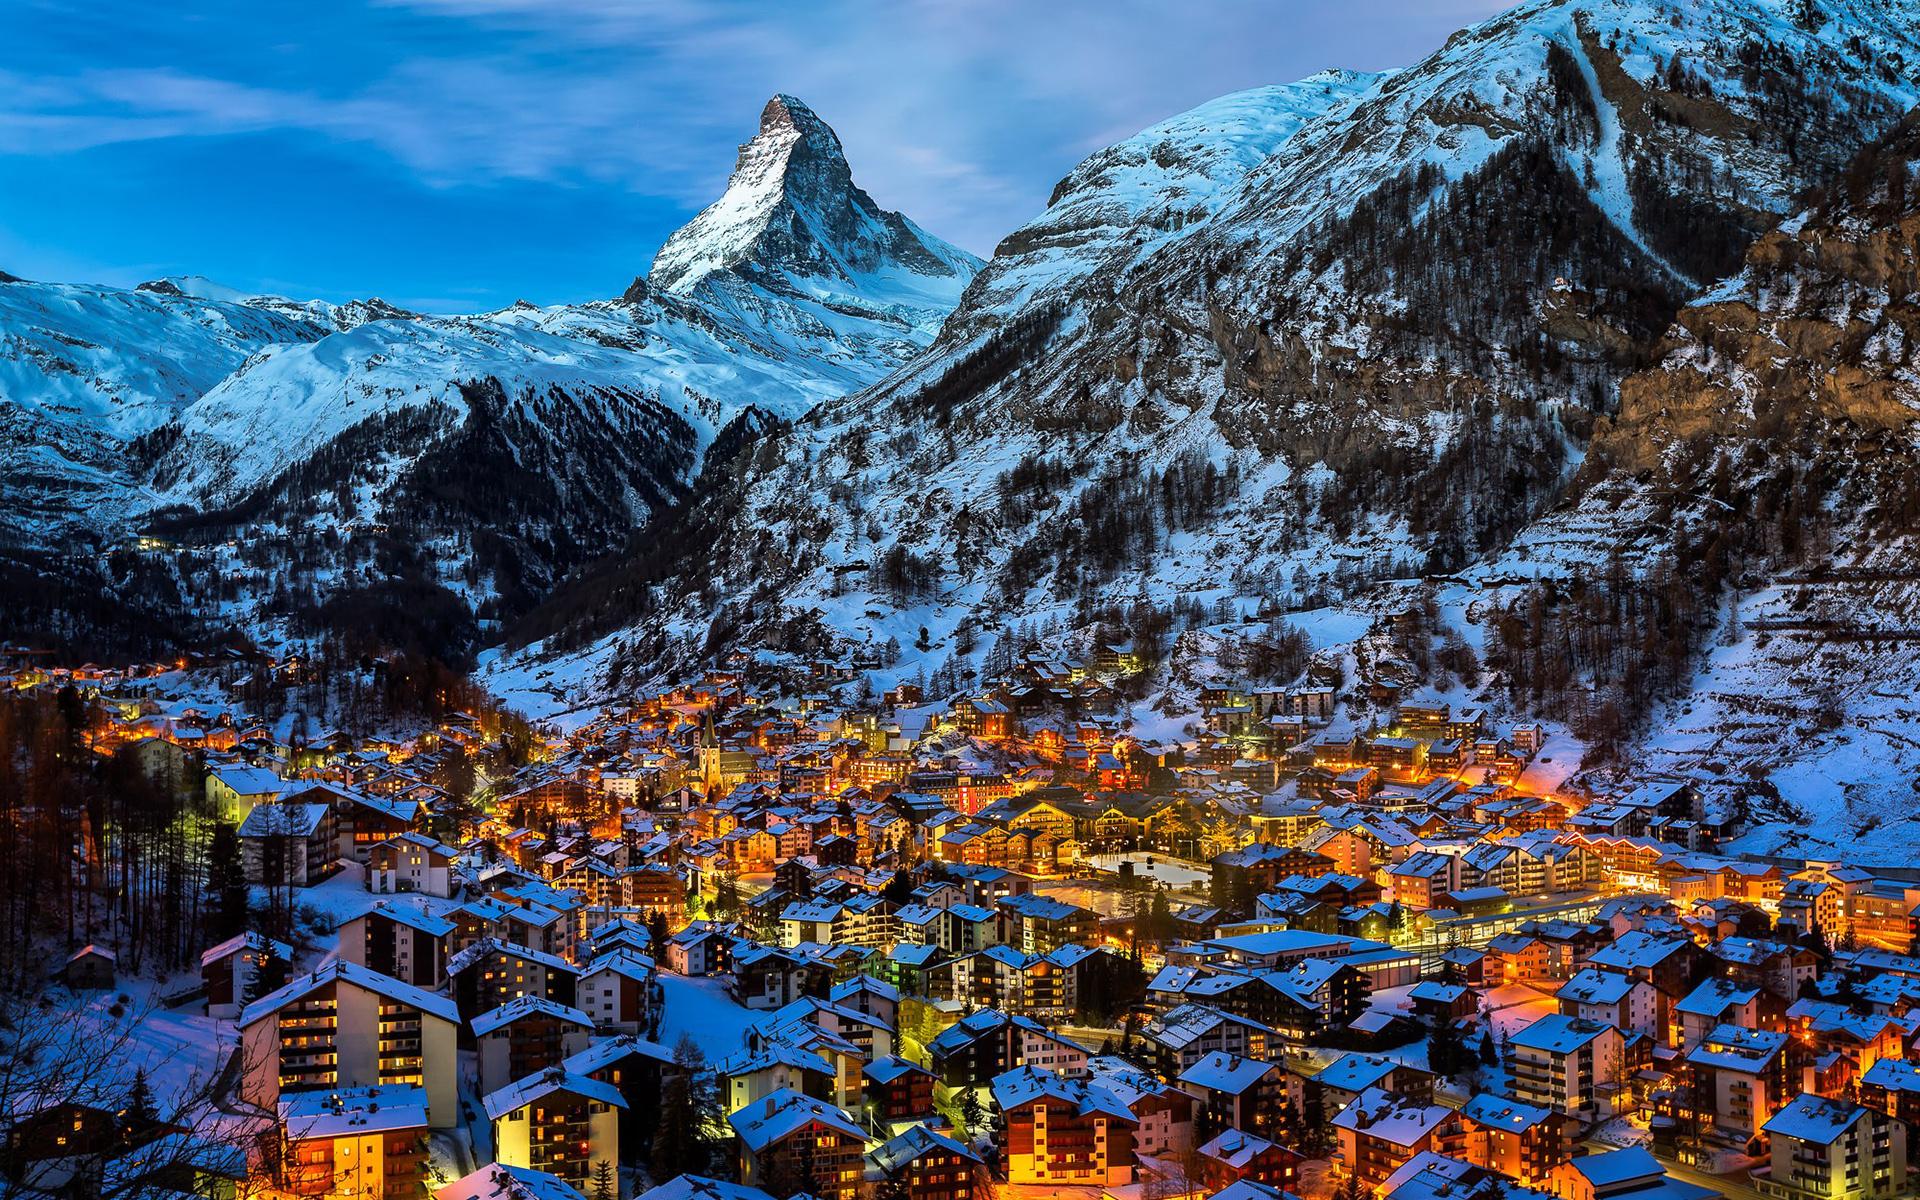 Zermatt Fondo De Pantalla Hd Fondo De Escritorio